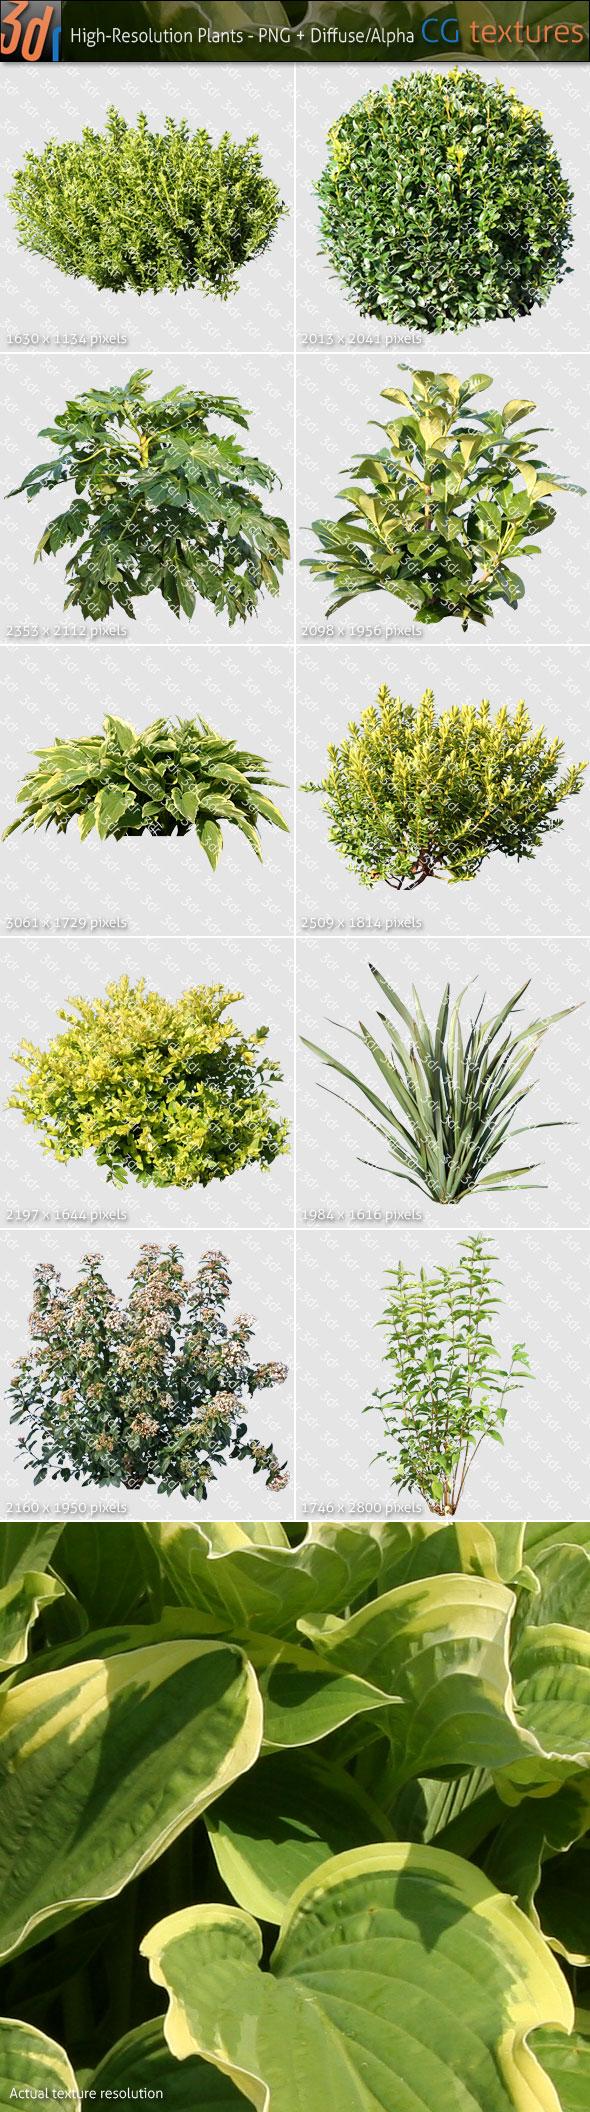 Plants Textures Hi-Res Collection 01